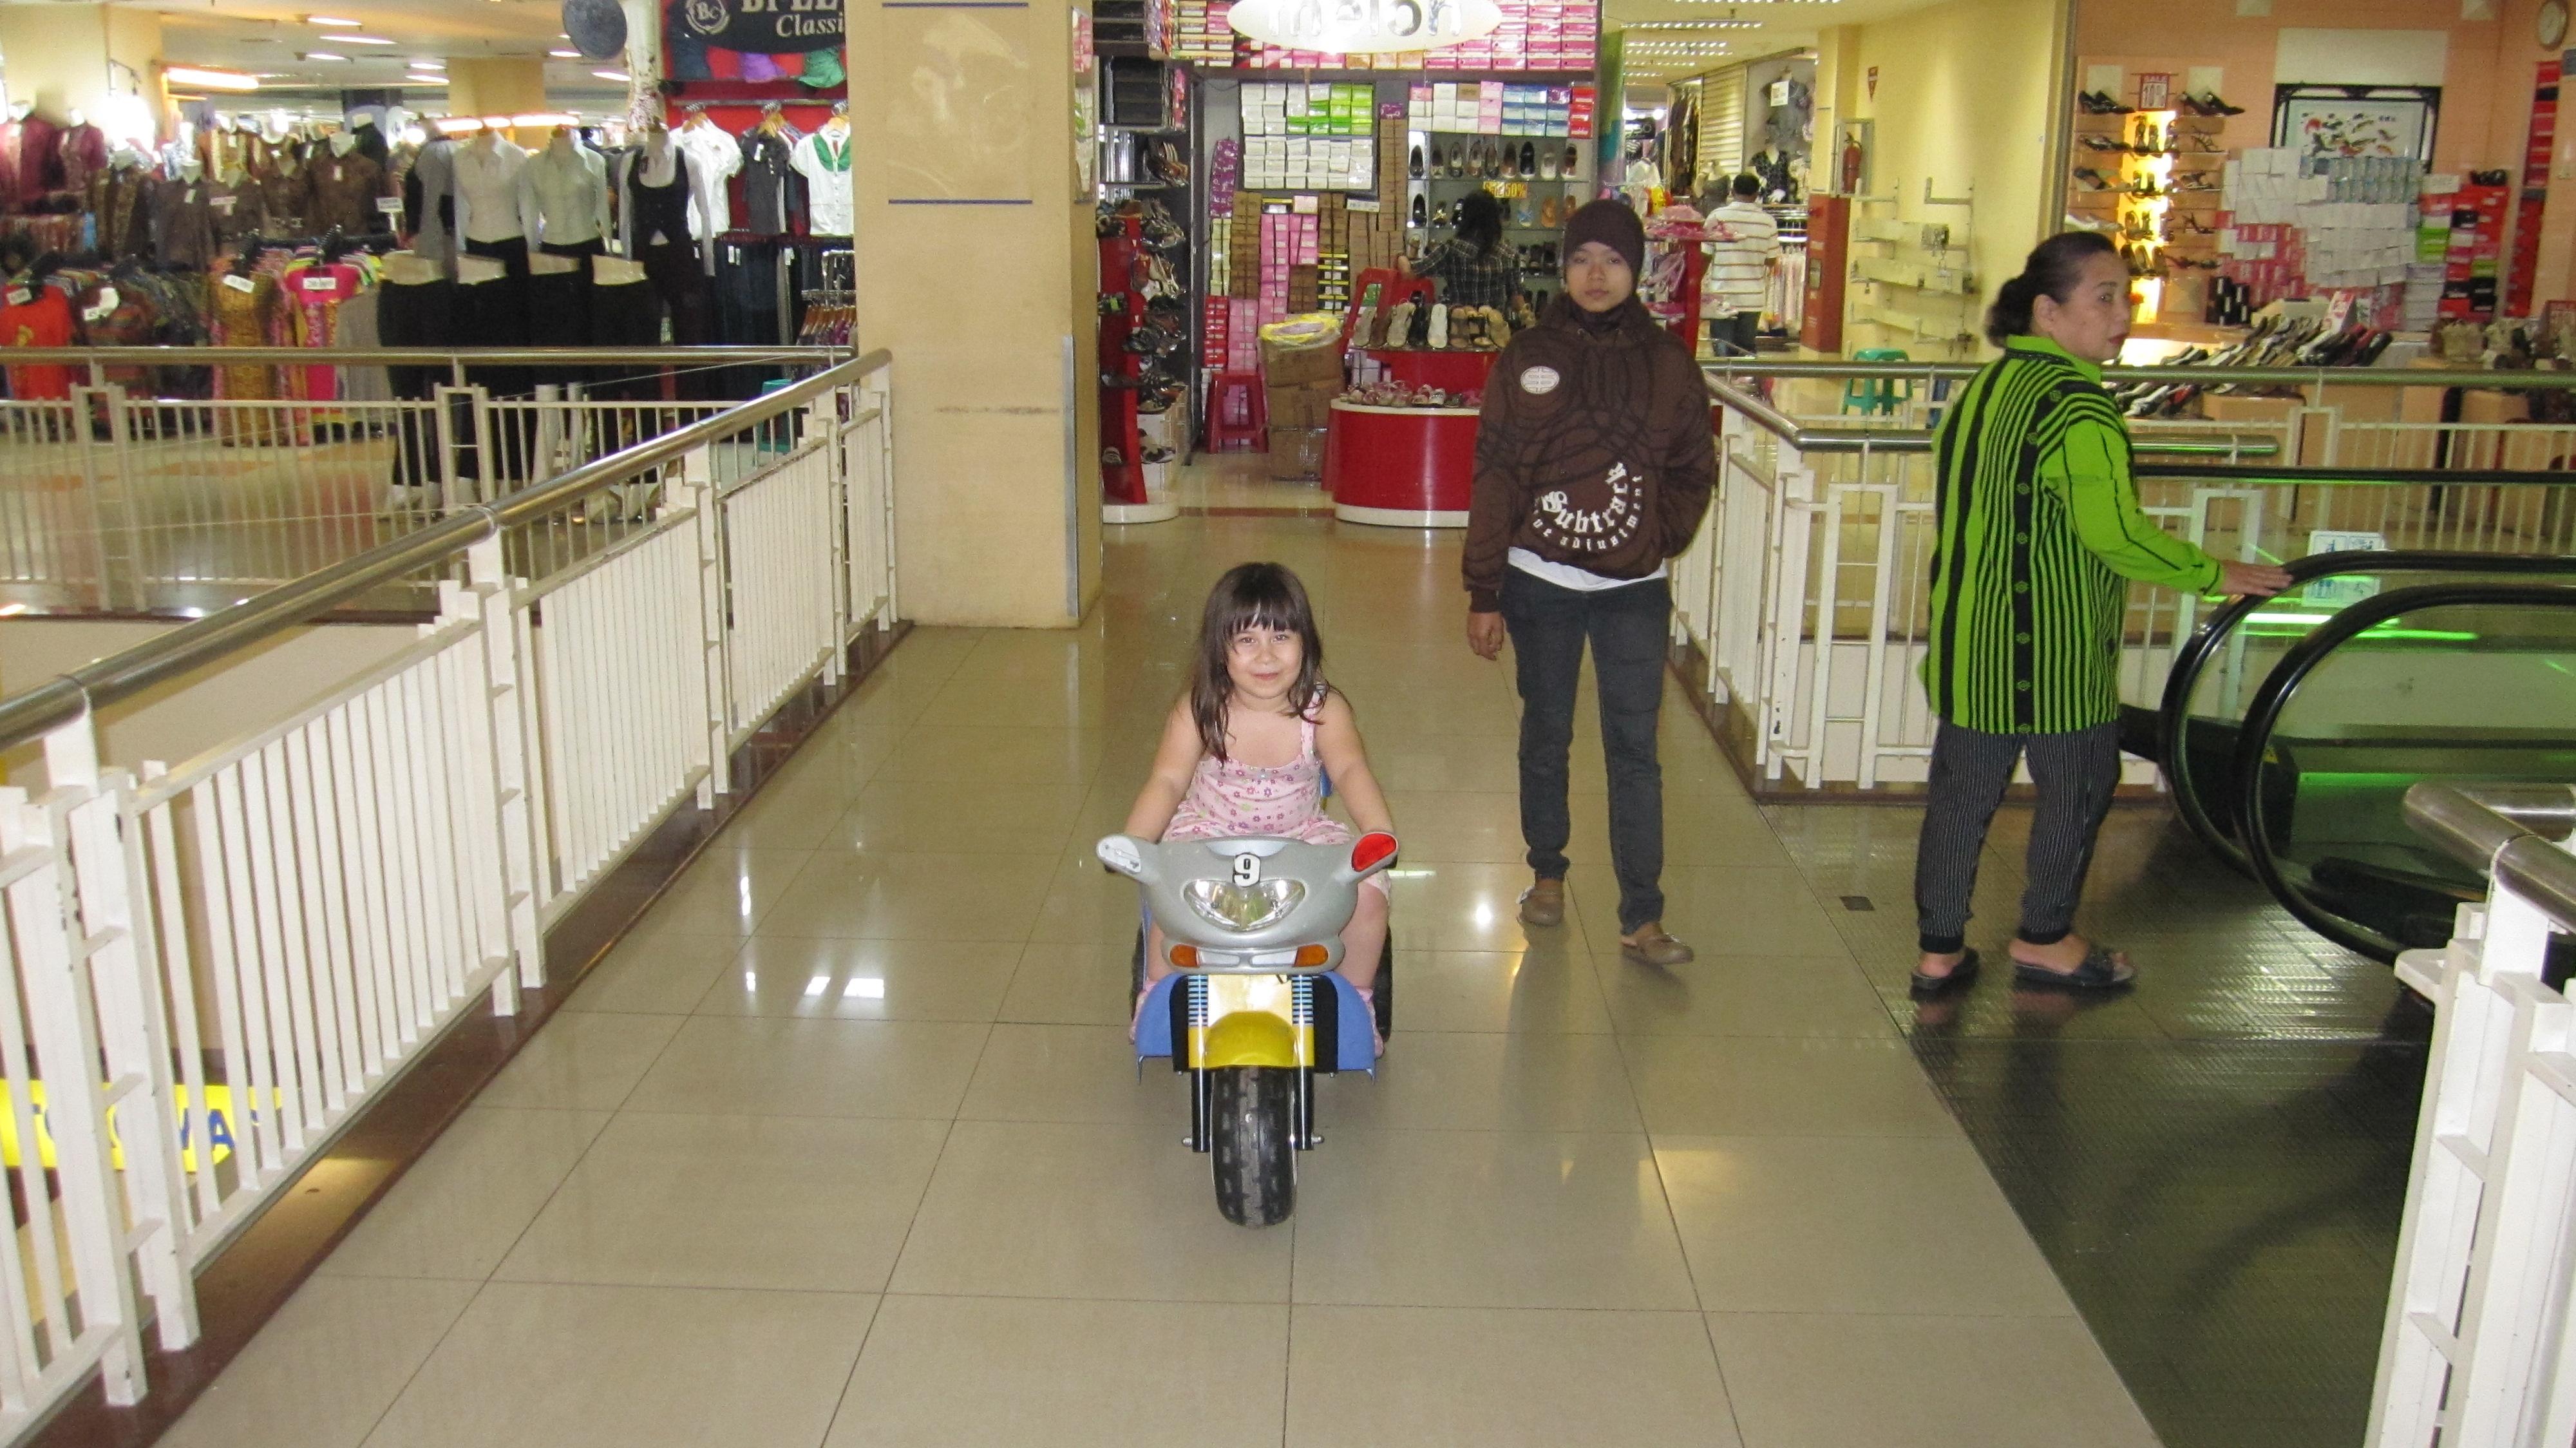 Sarah beim Electro Motorad fahren im ITC BSD-City